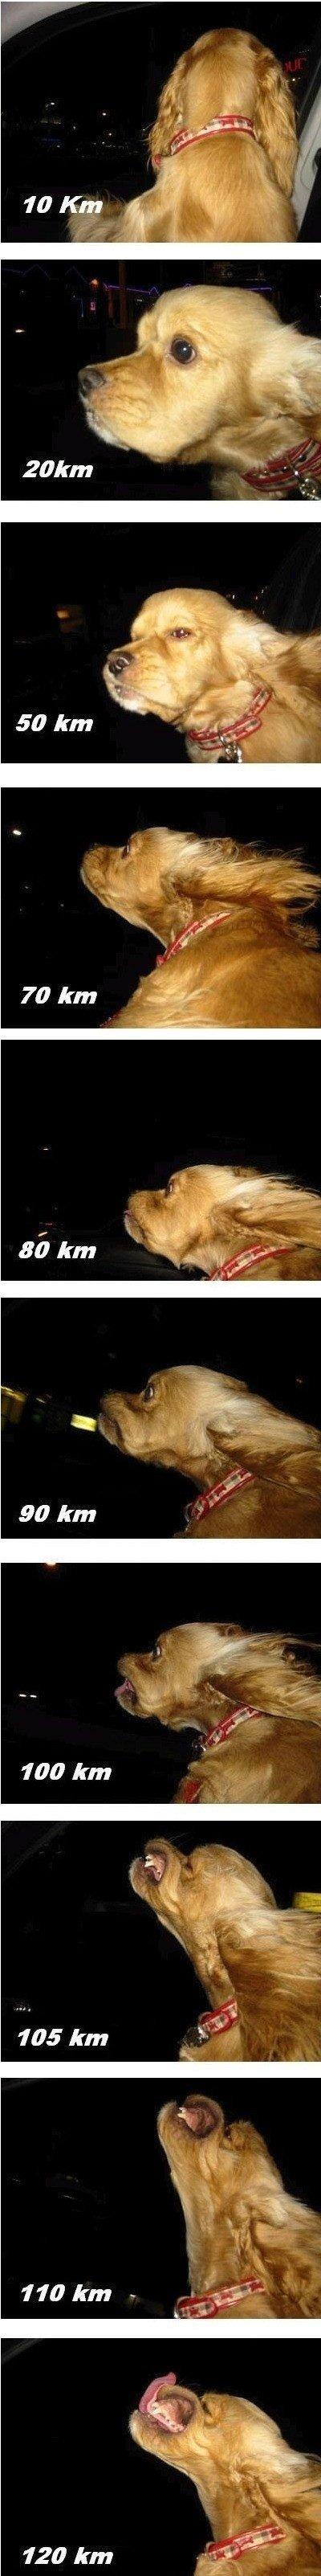 speeding up. . 50 km 90 km. Your dog enjoys speed. Mine just eats thumbs.